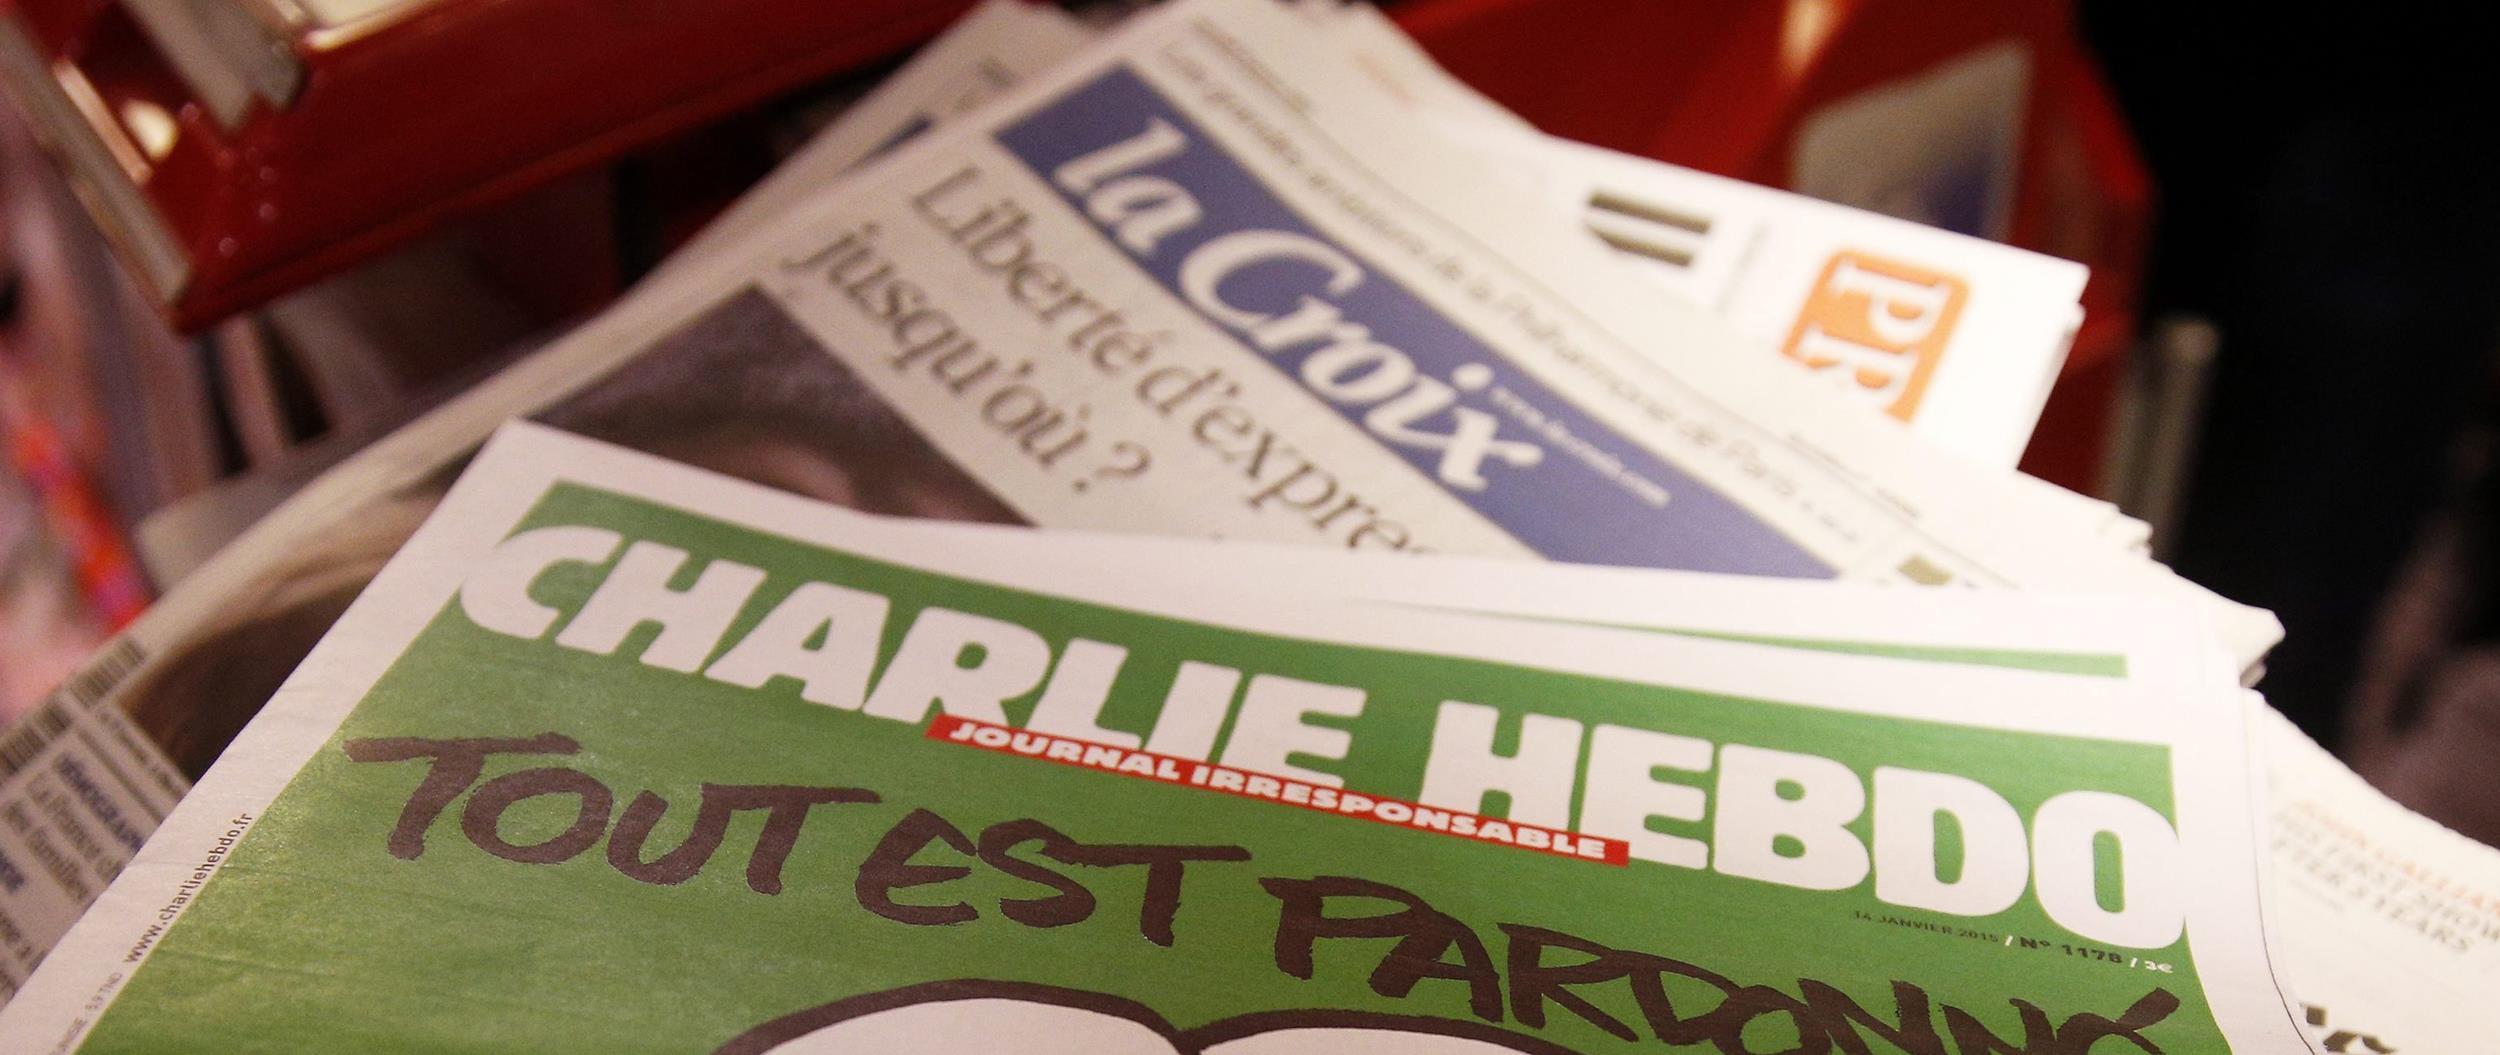 Paris Attack Response Stirs #JeNeSuisPasCharlie Discussion ...